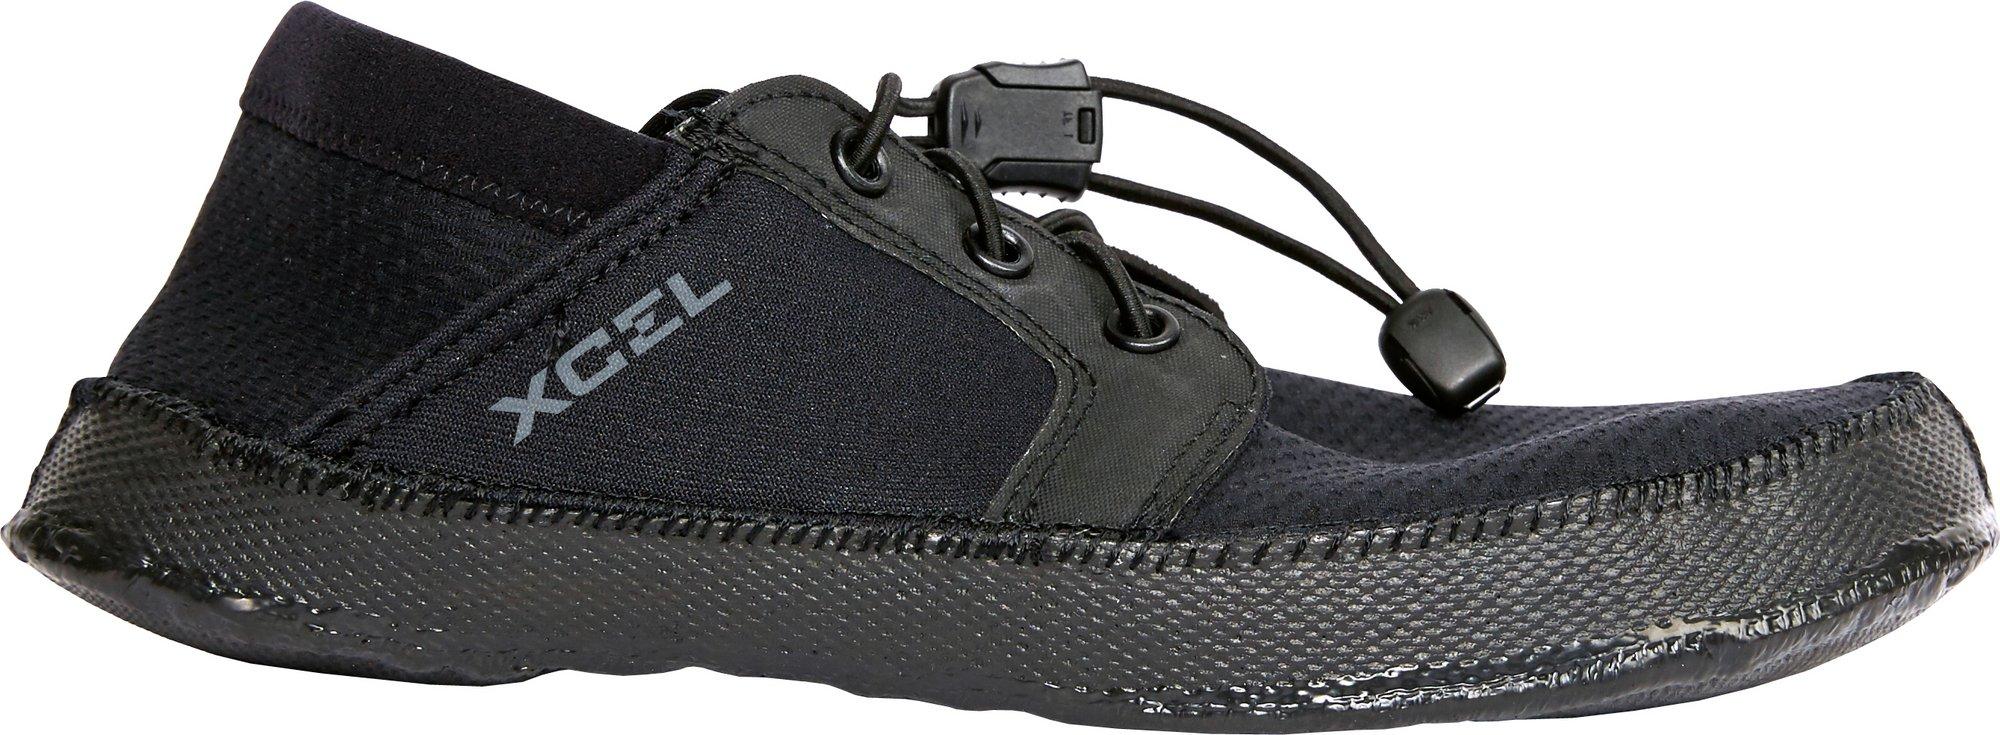 Xcel Ventiprene Boot